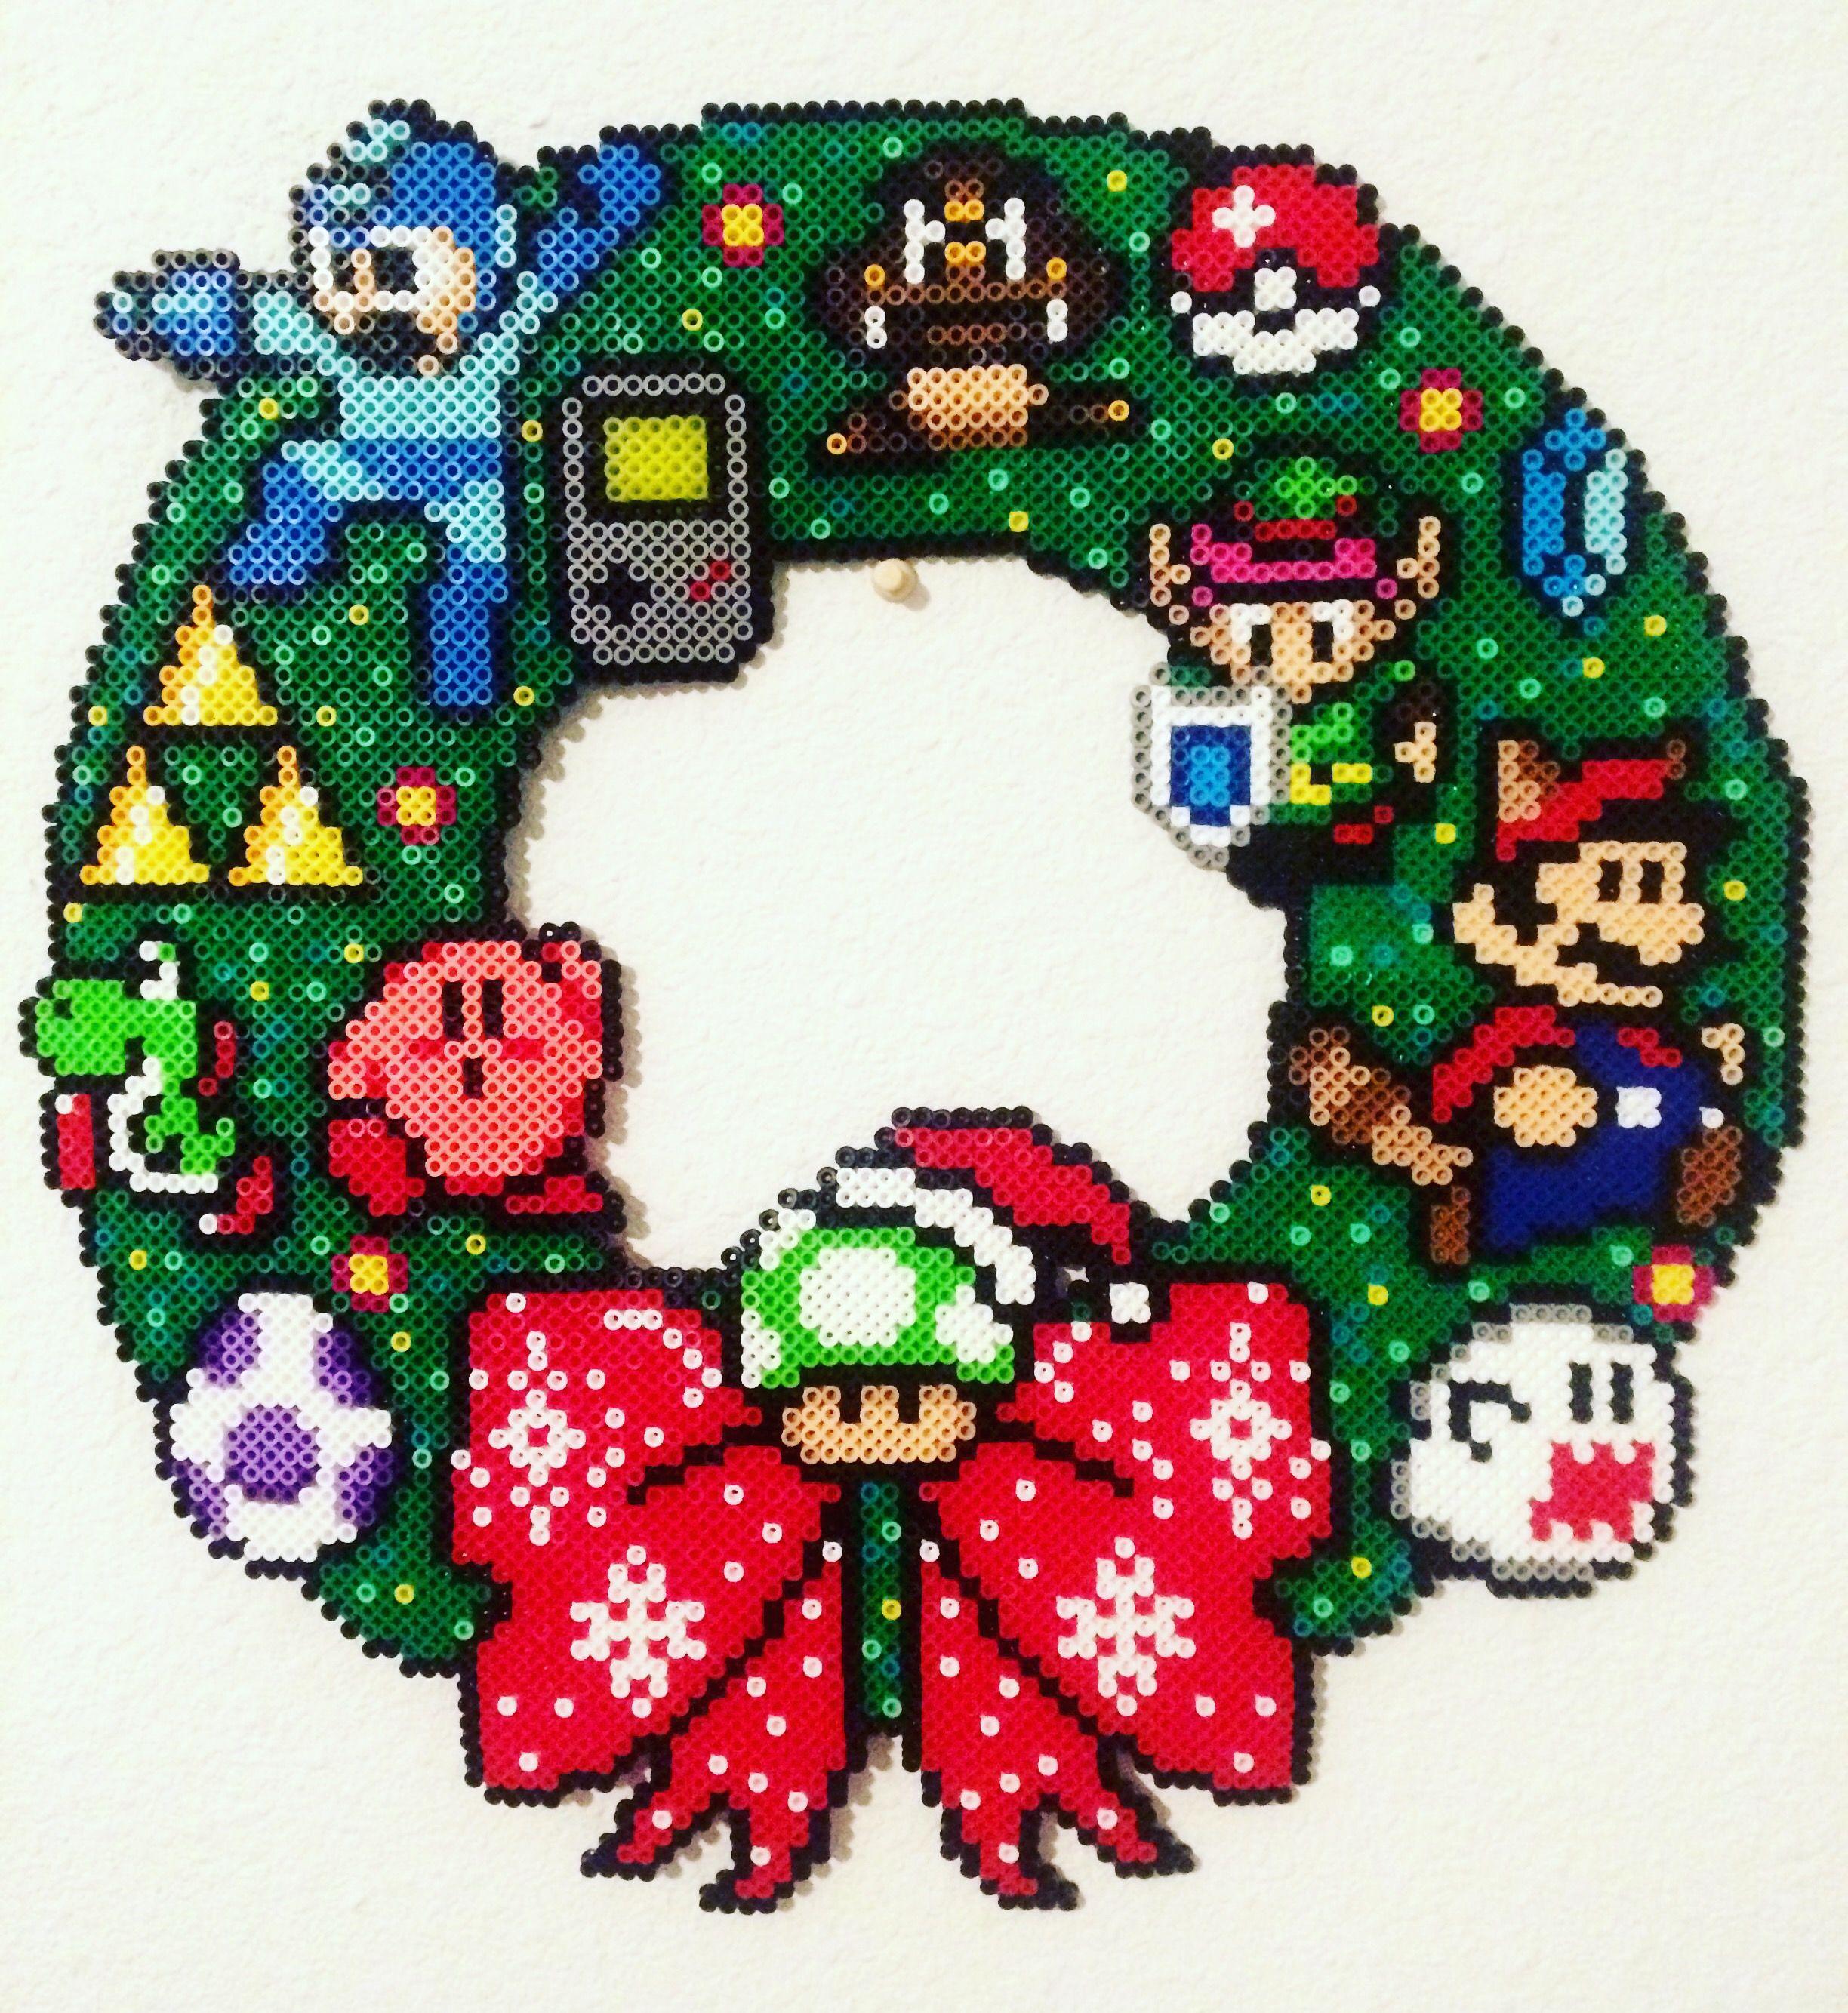 8-bit Nintendo Wreath | Perler-Games/Books | Pinterest | Nintendo ...